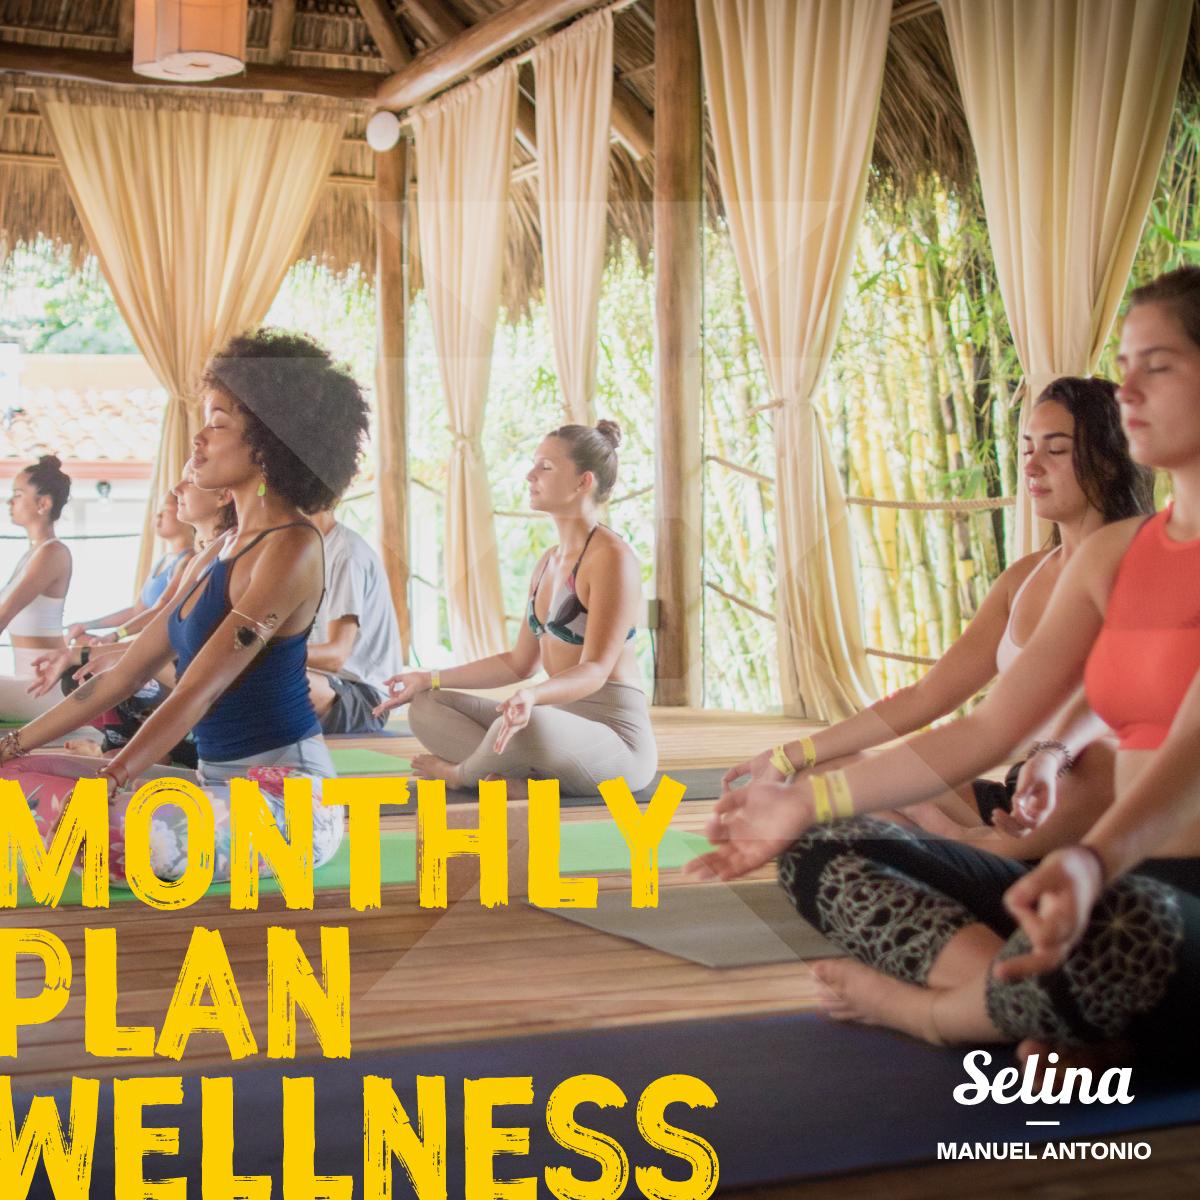 Wellness Montlhy